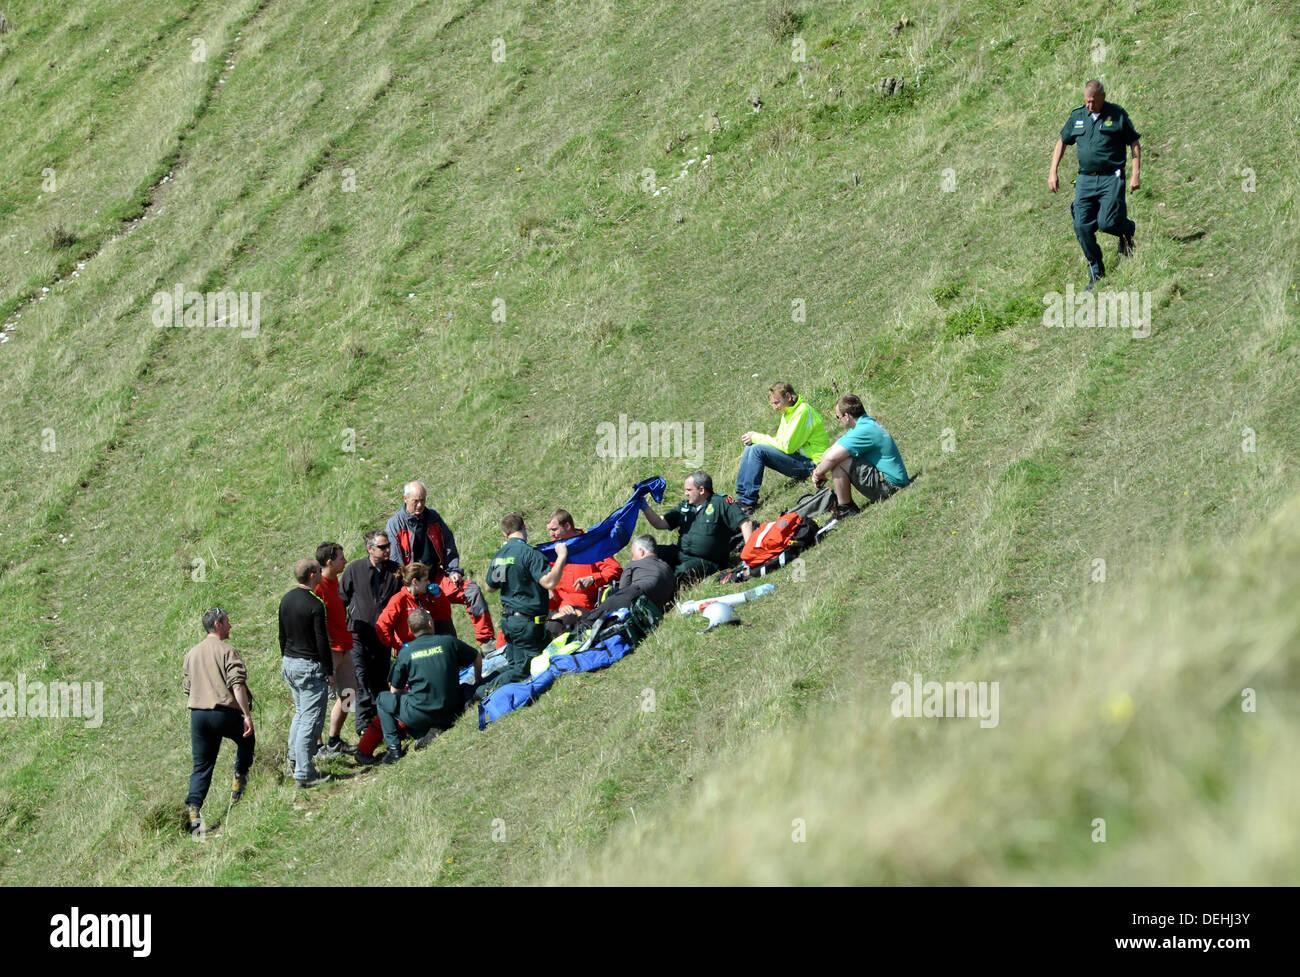 Kent de ambulancia aérea que asistían a la escena de un accidente de parapente, Monte Caburn, Lewes East Sussex Imagen De Stock